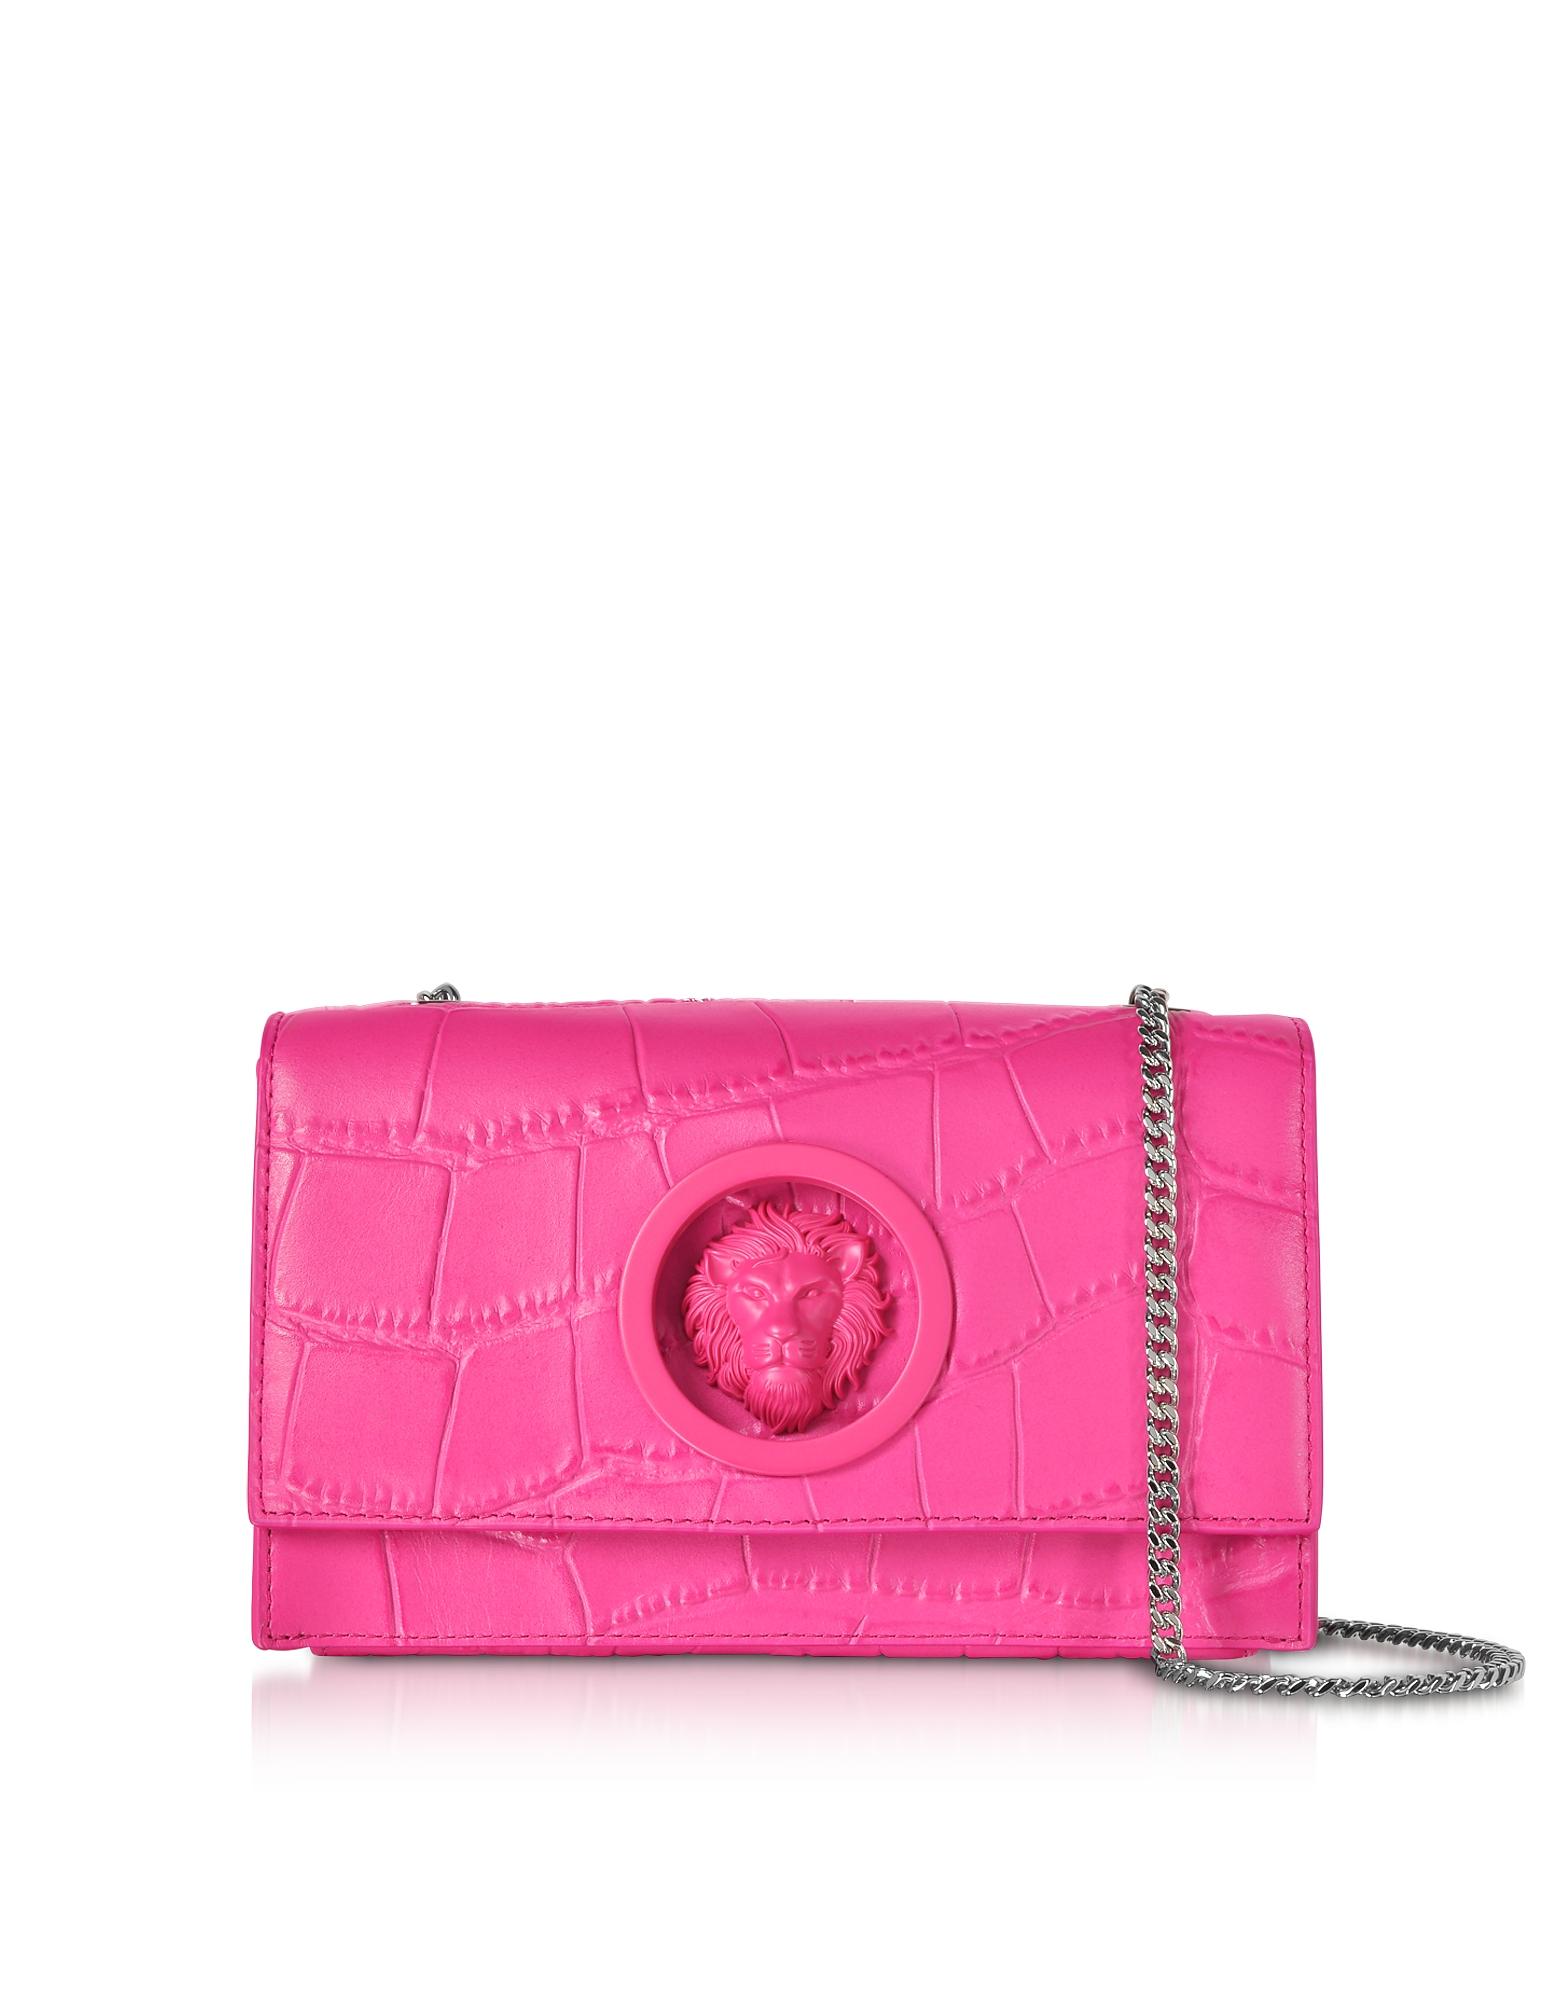 Versace Versus Handbags, Lion Mock Croco-Embossed Leather Shoulder Bag